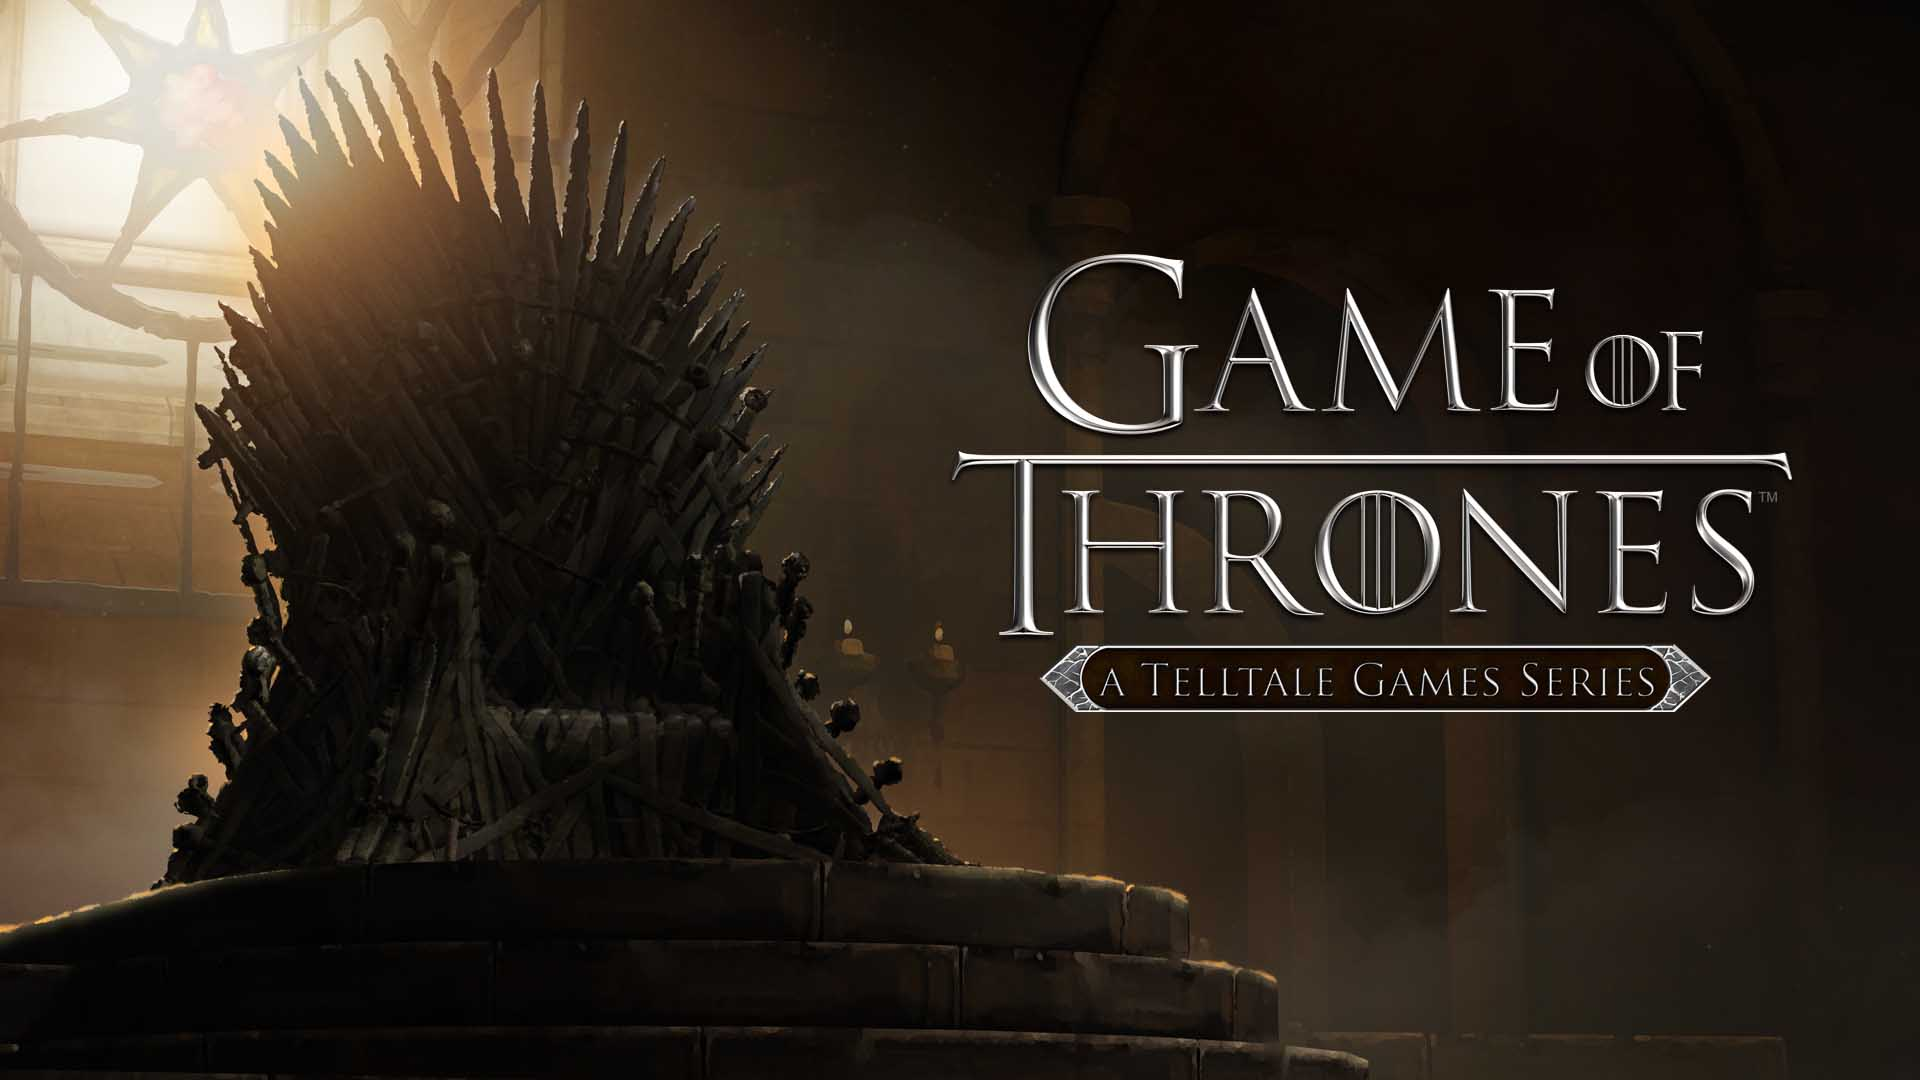 Game-of-Thrones-A-Telltale-Game-header.jpg